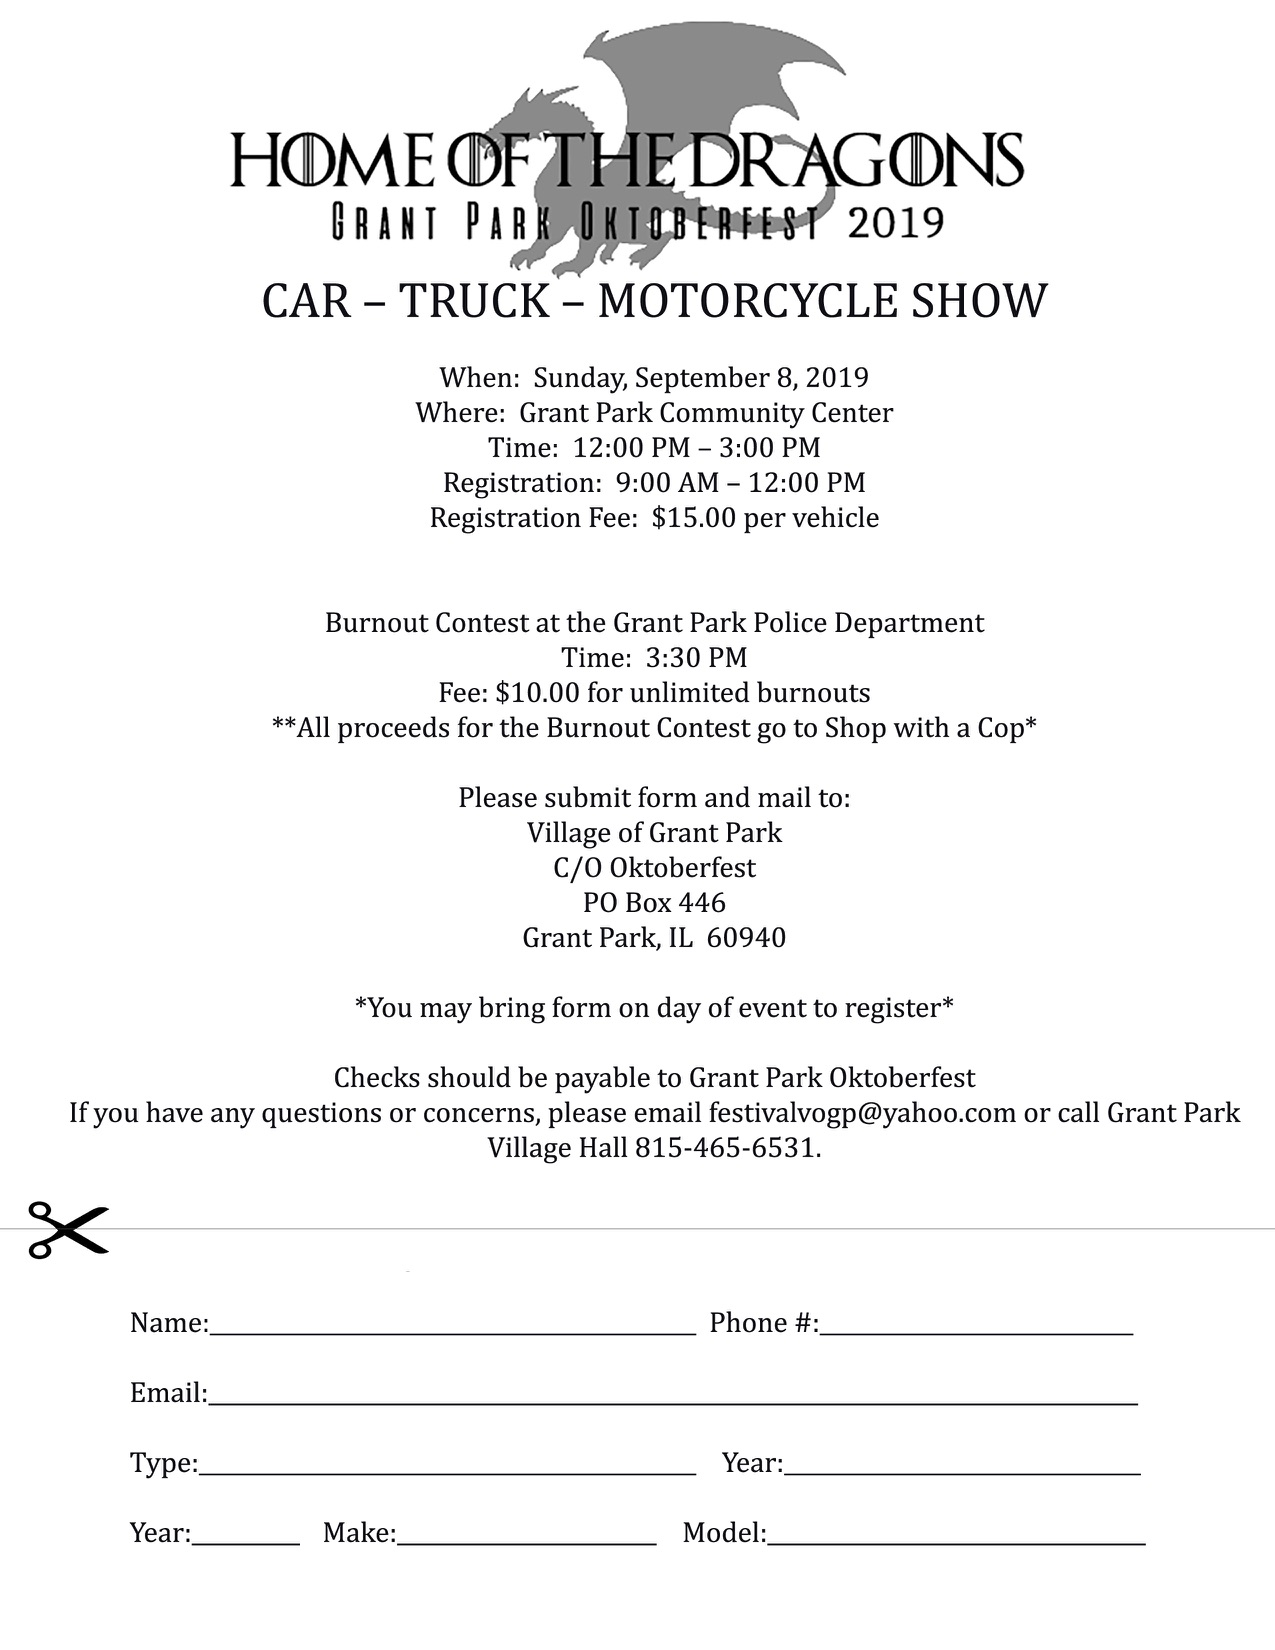 Car Show Form.jpg